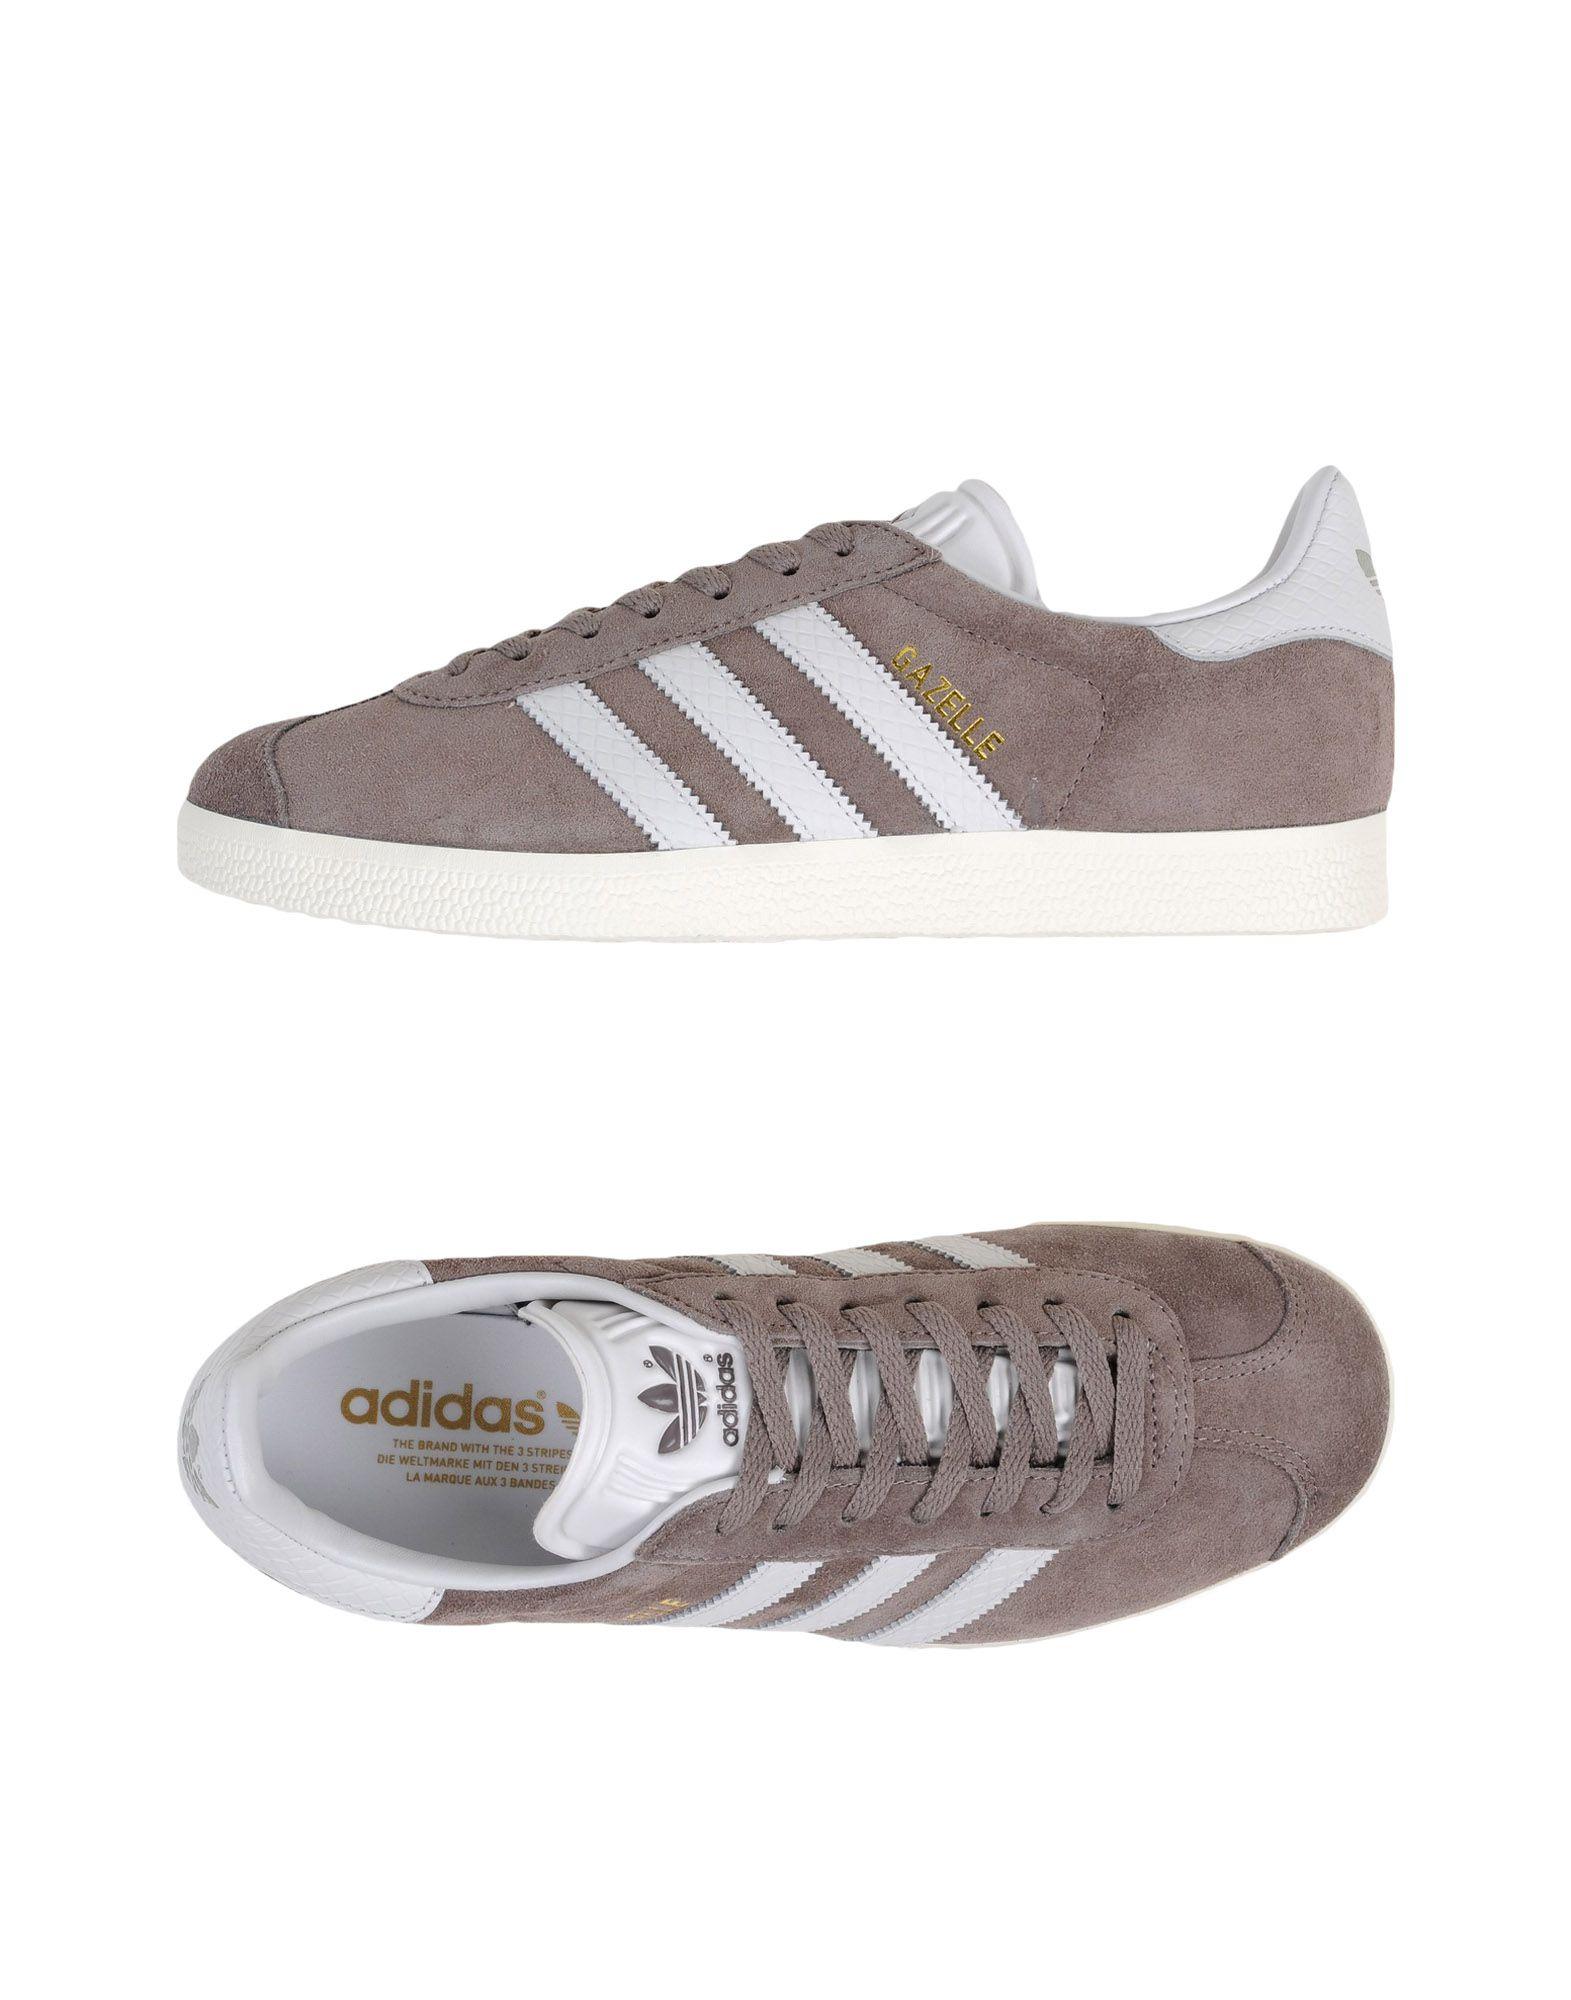 on sale 3e11d 6a6a5 ADIDAS ORIGINALS. GAZELLE W. Sneakers